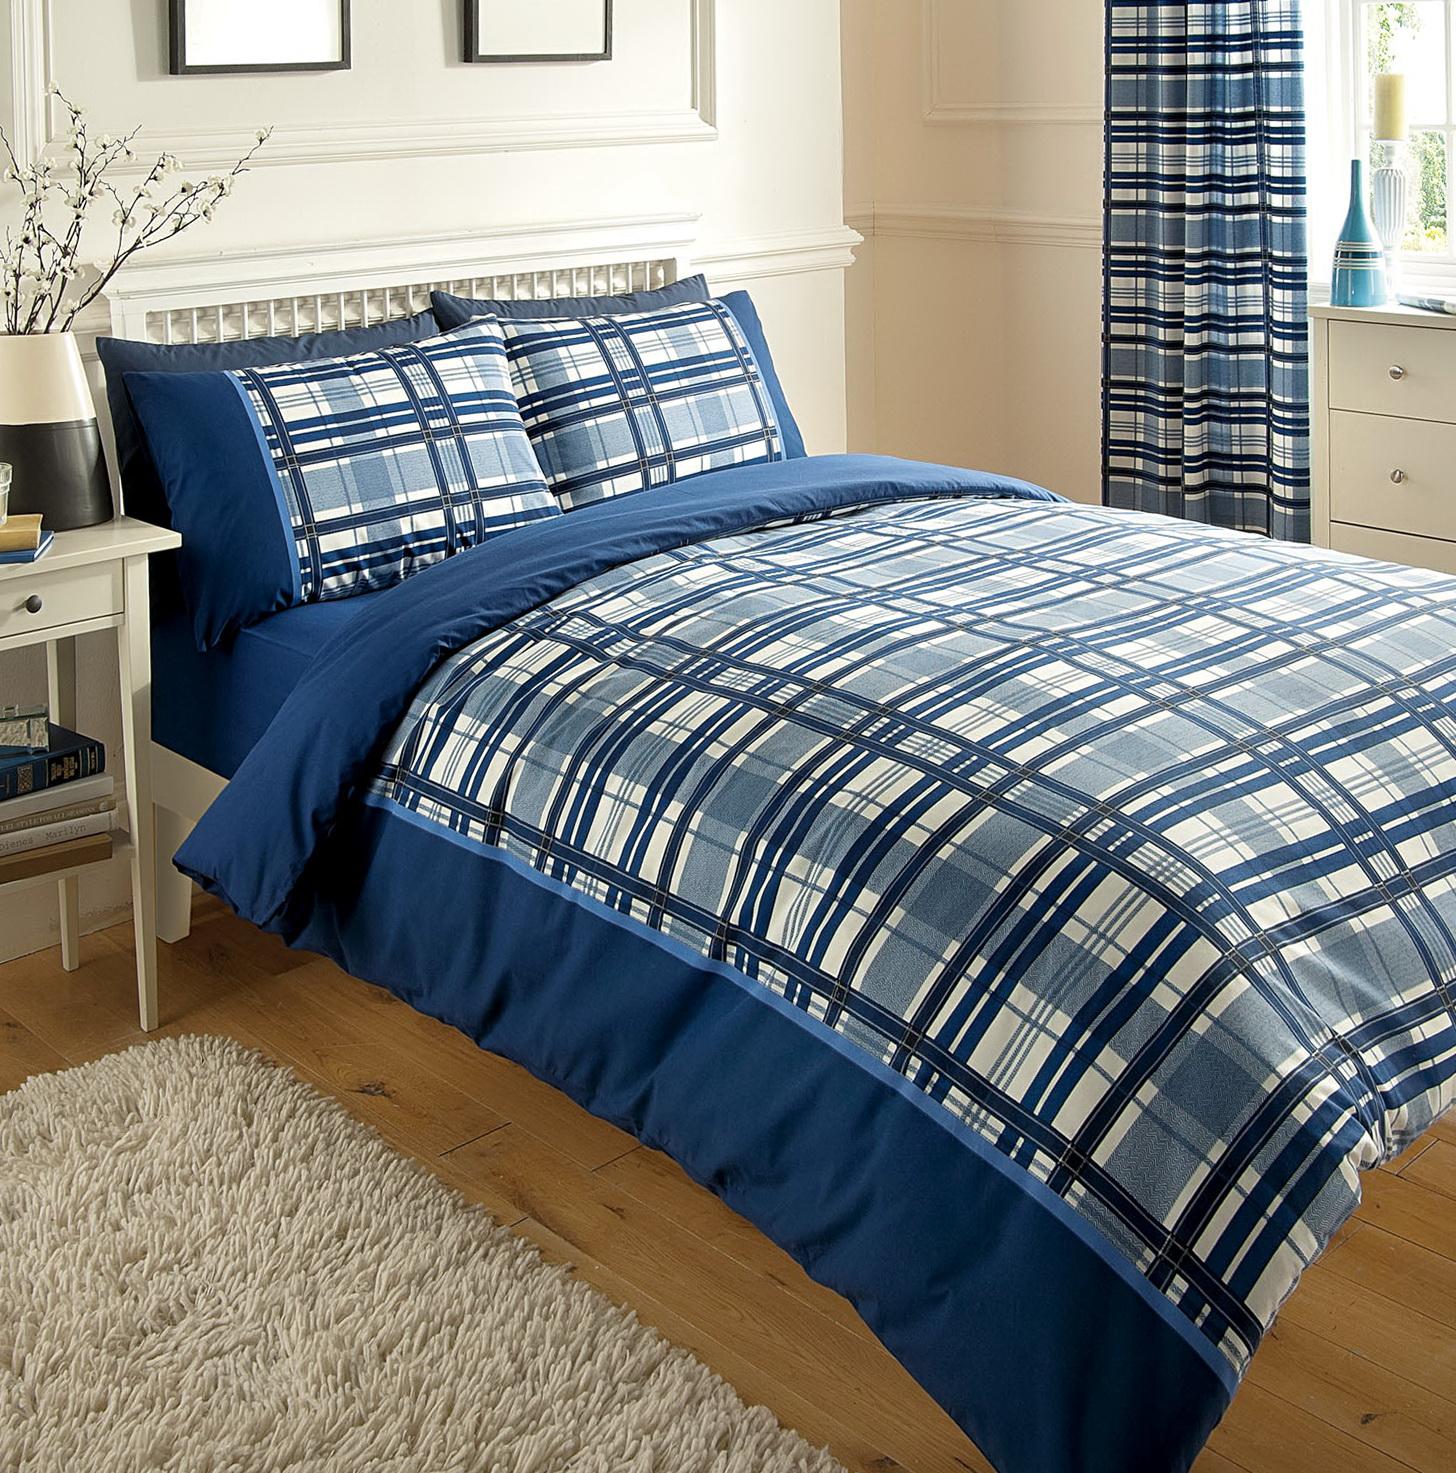 Blue Chevron Bedding Set